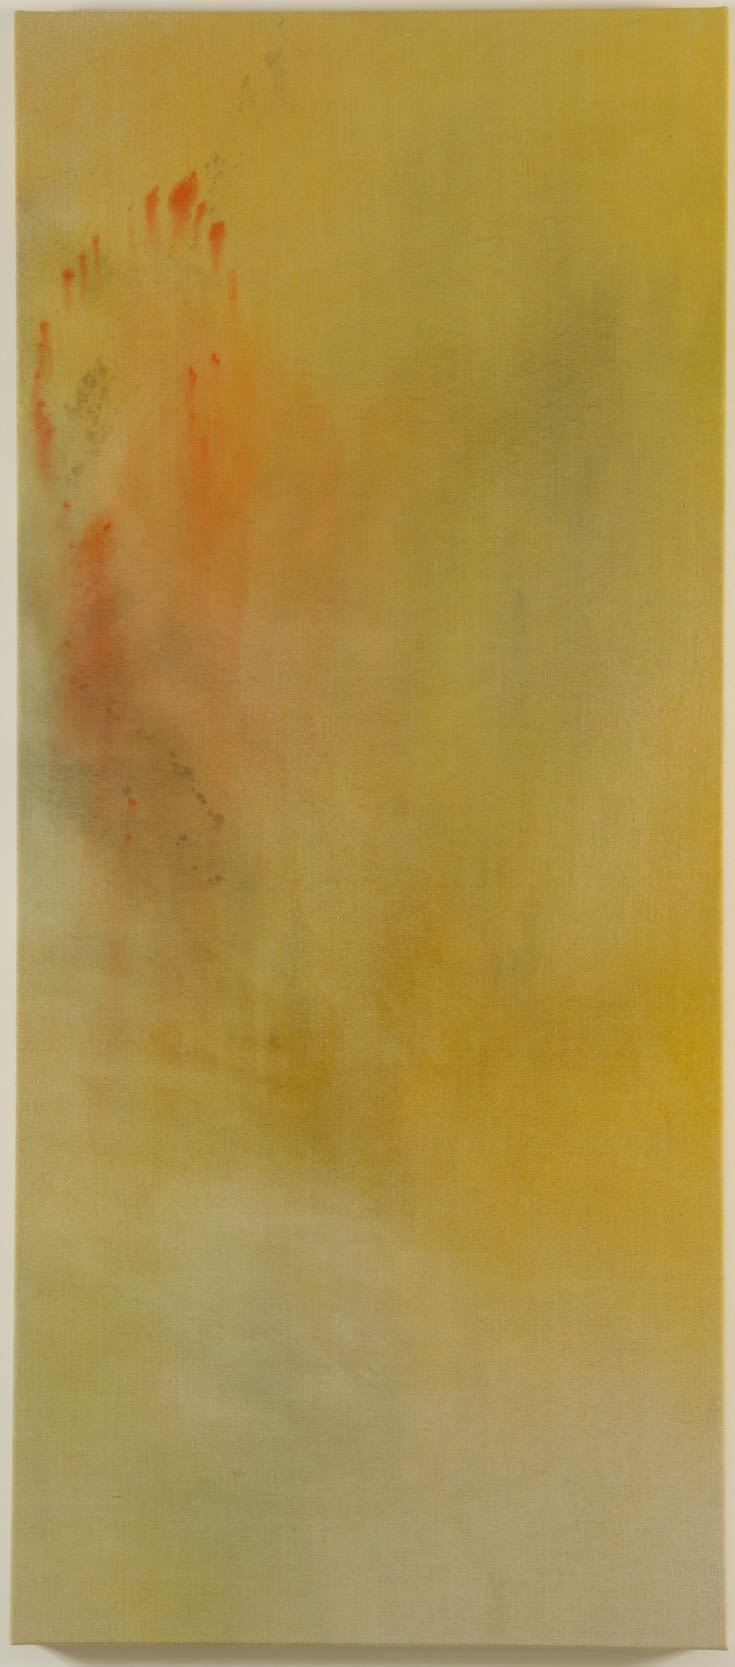 Michael Biberstein Sem título Acílico s/ linho 160.5 x 70.5 x 5 cm